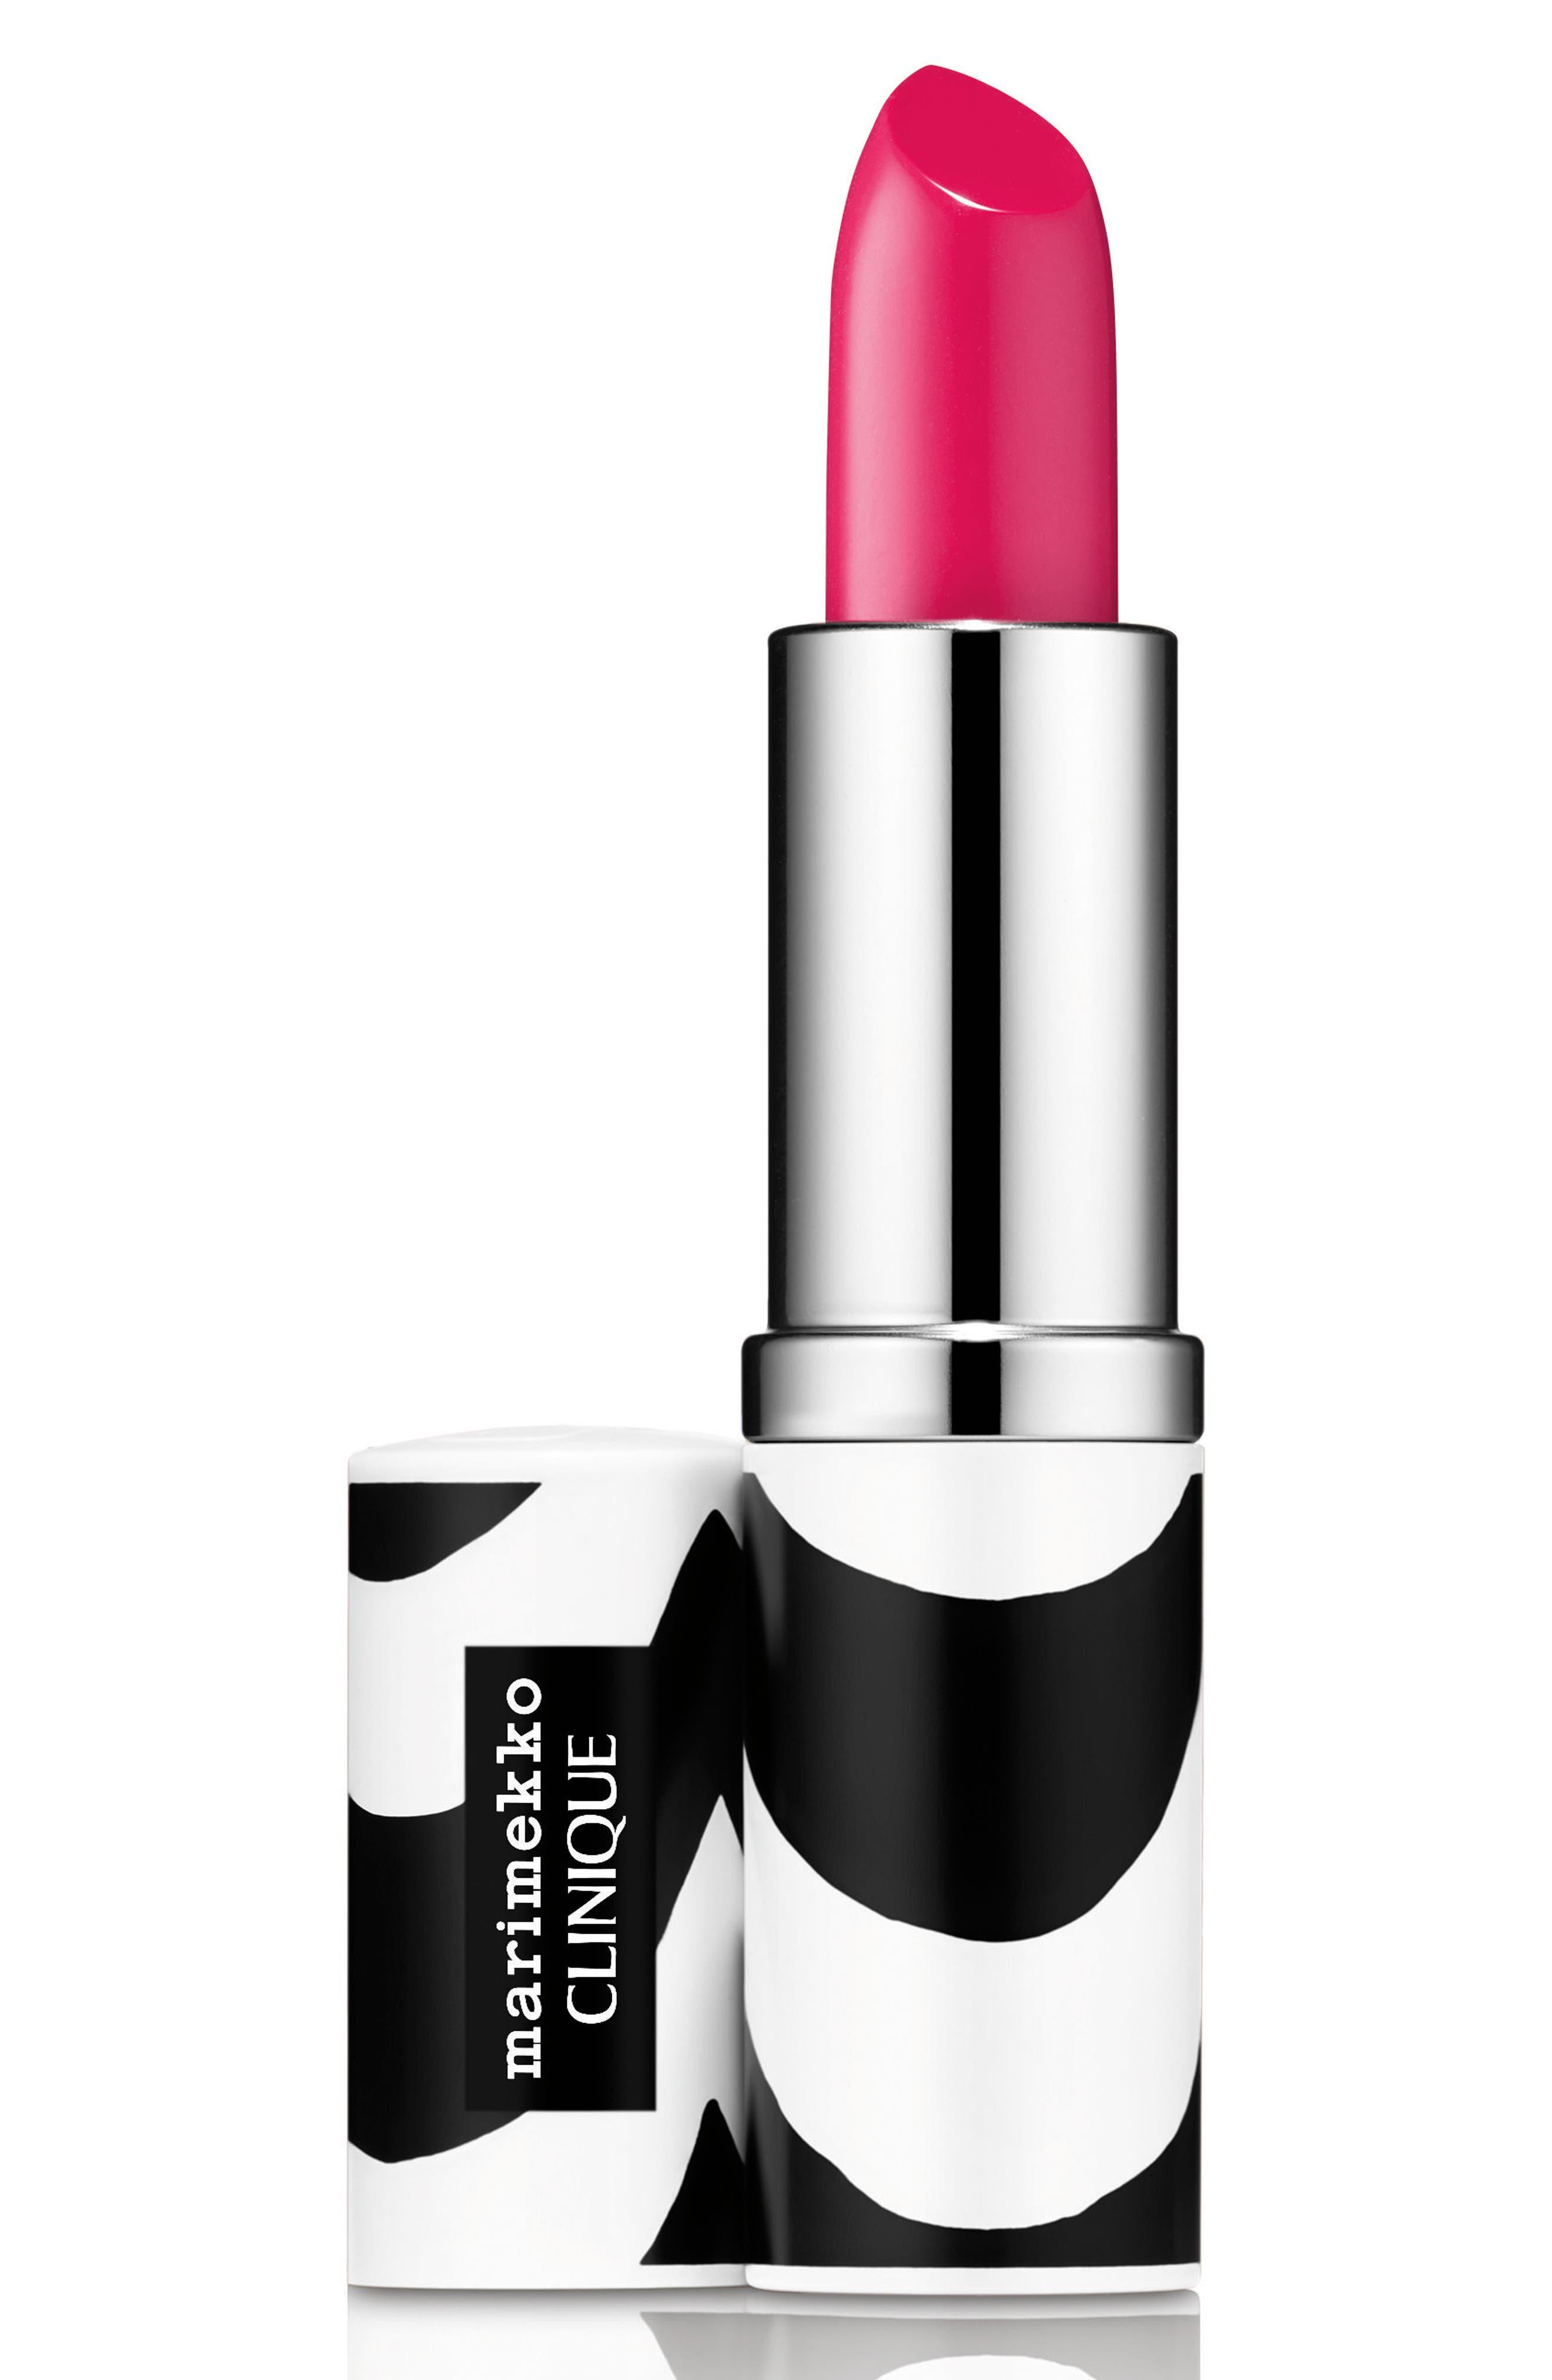 Clinique Marimekko Pop Lipstick